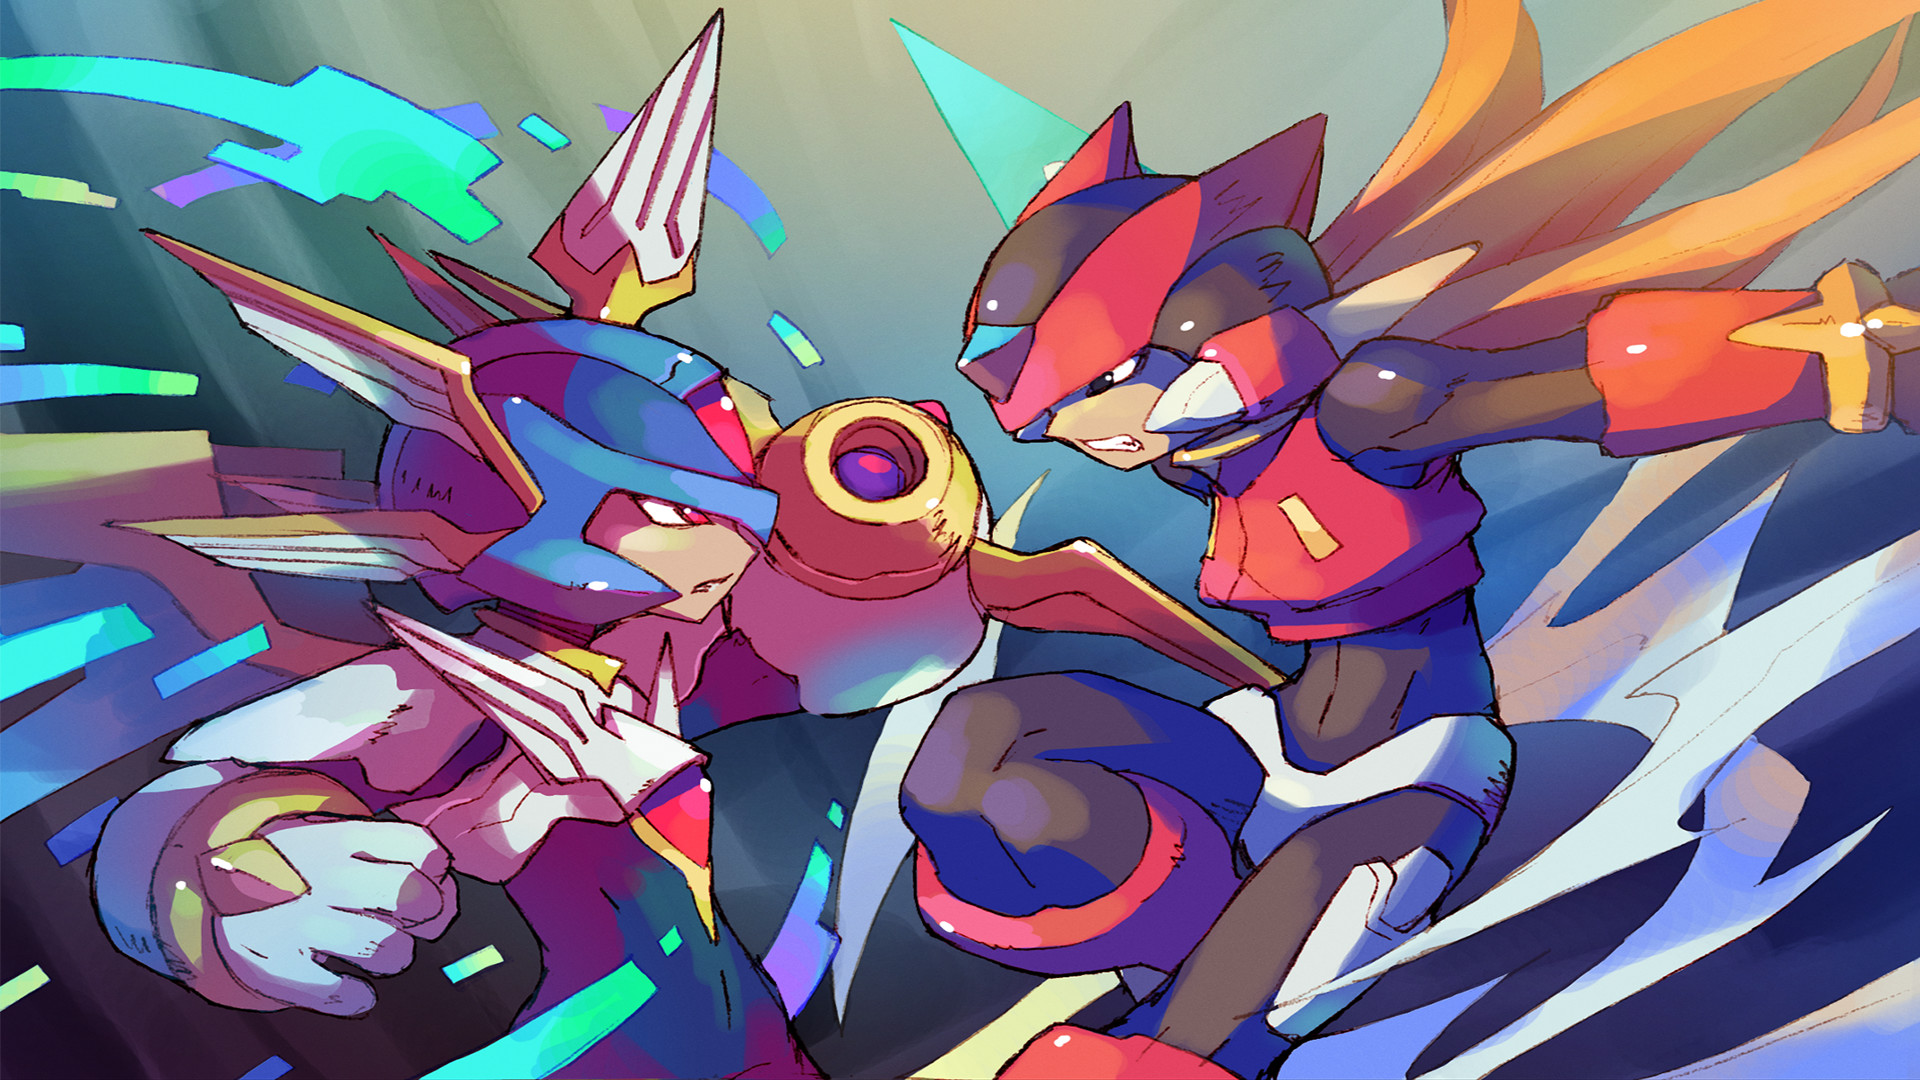 Copy X Mega Man Zero Wallpapers by Dana McCreary